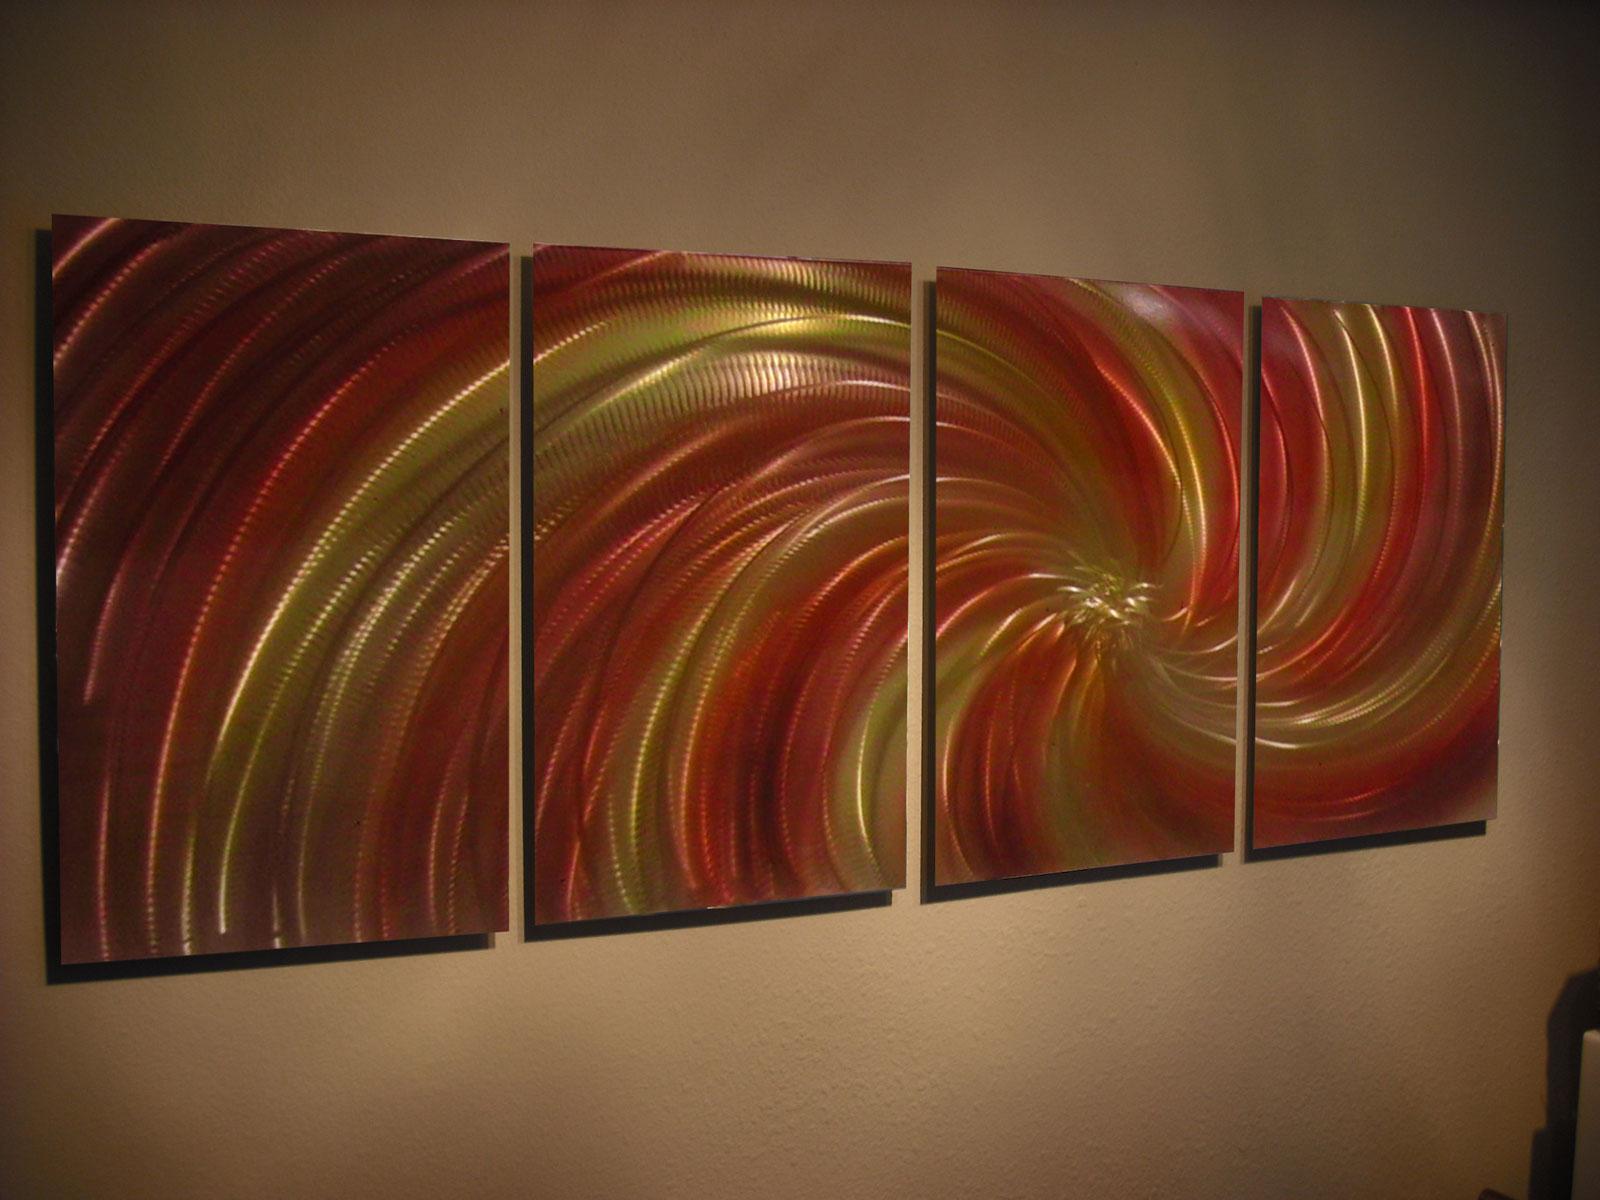 abstract metal wall art. Harvest - Abstract Metal Wall Art Contemporary Modern Decor